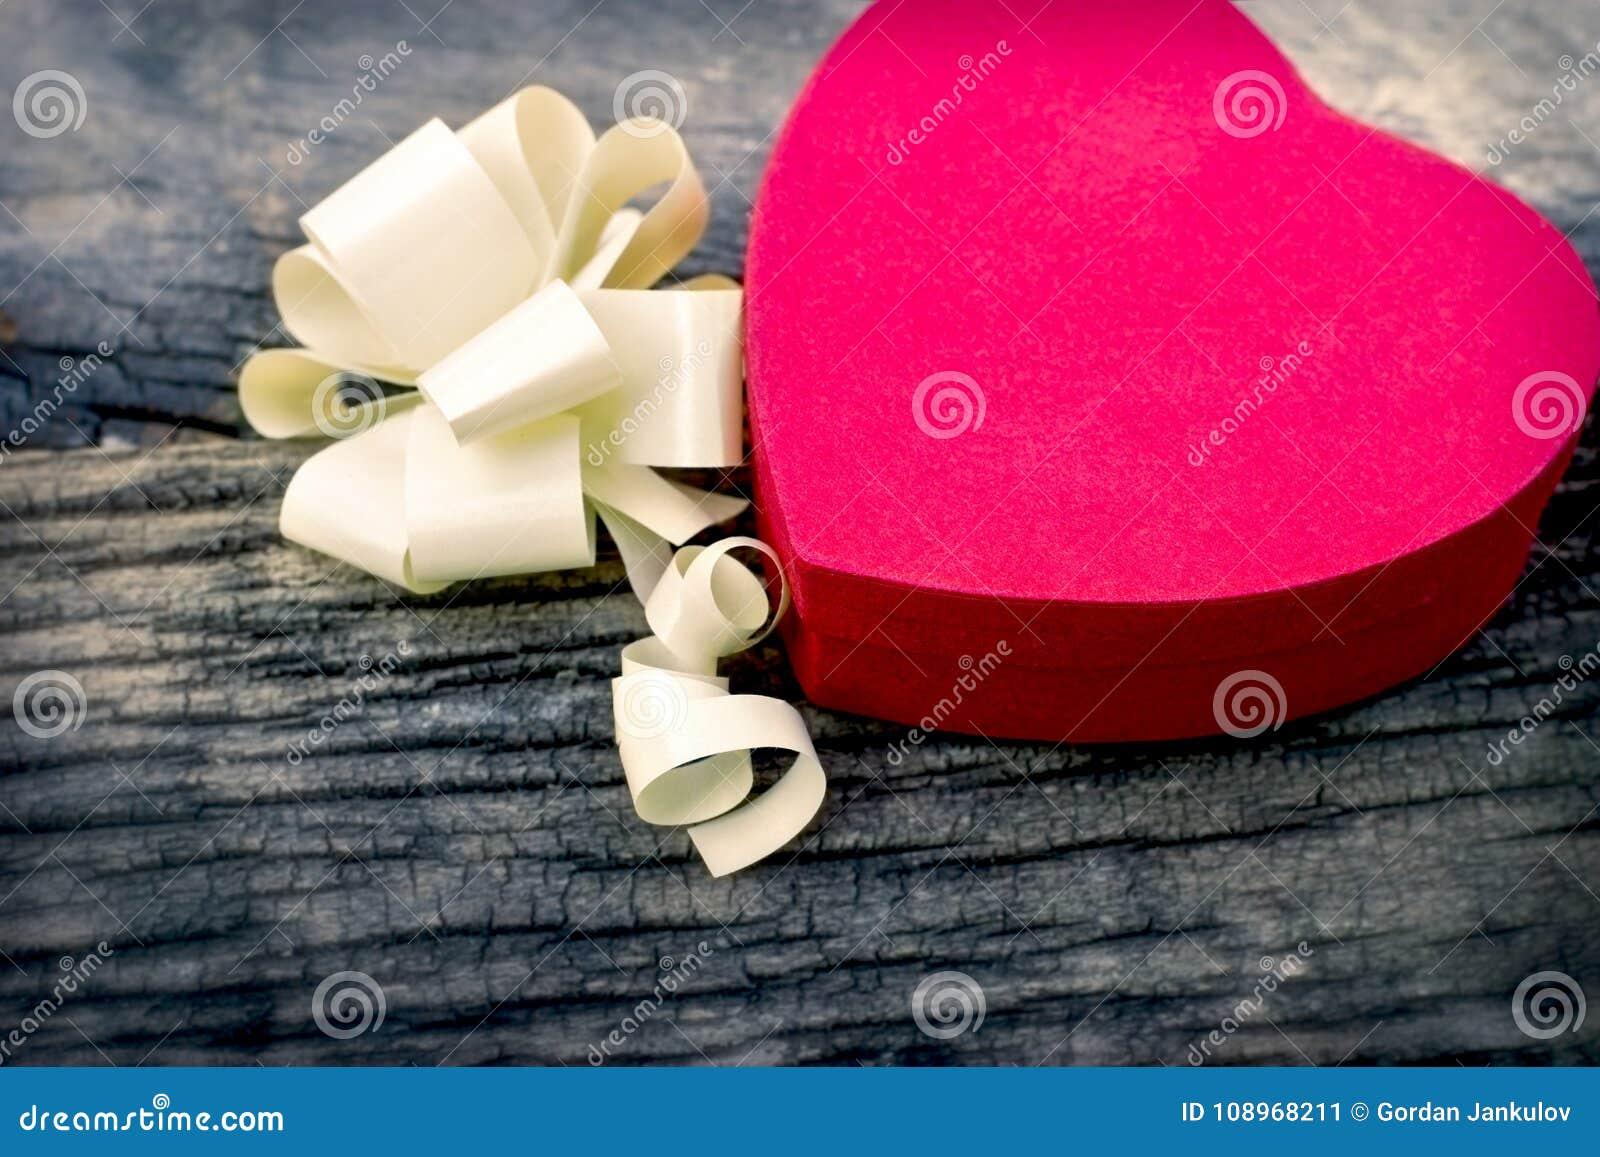 День ` s валентинки - коробка шоколадов, подарок для любовников